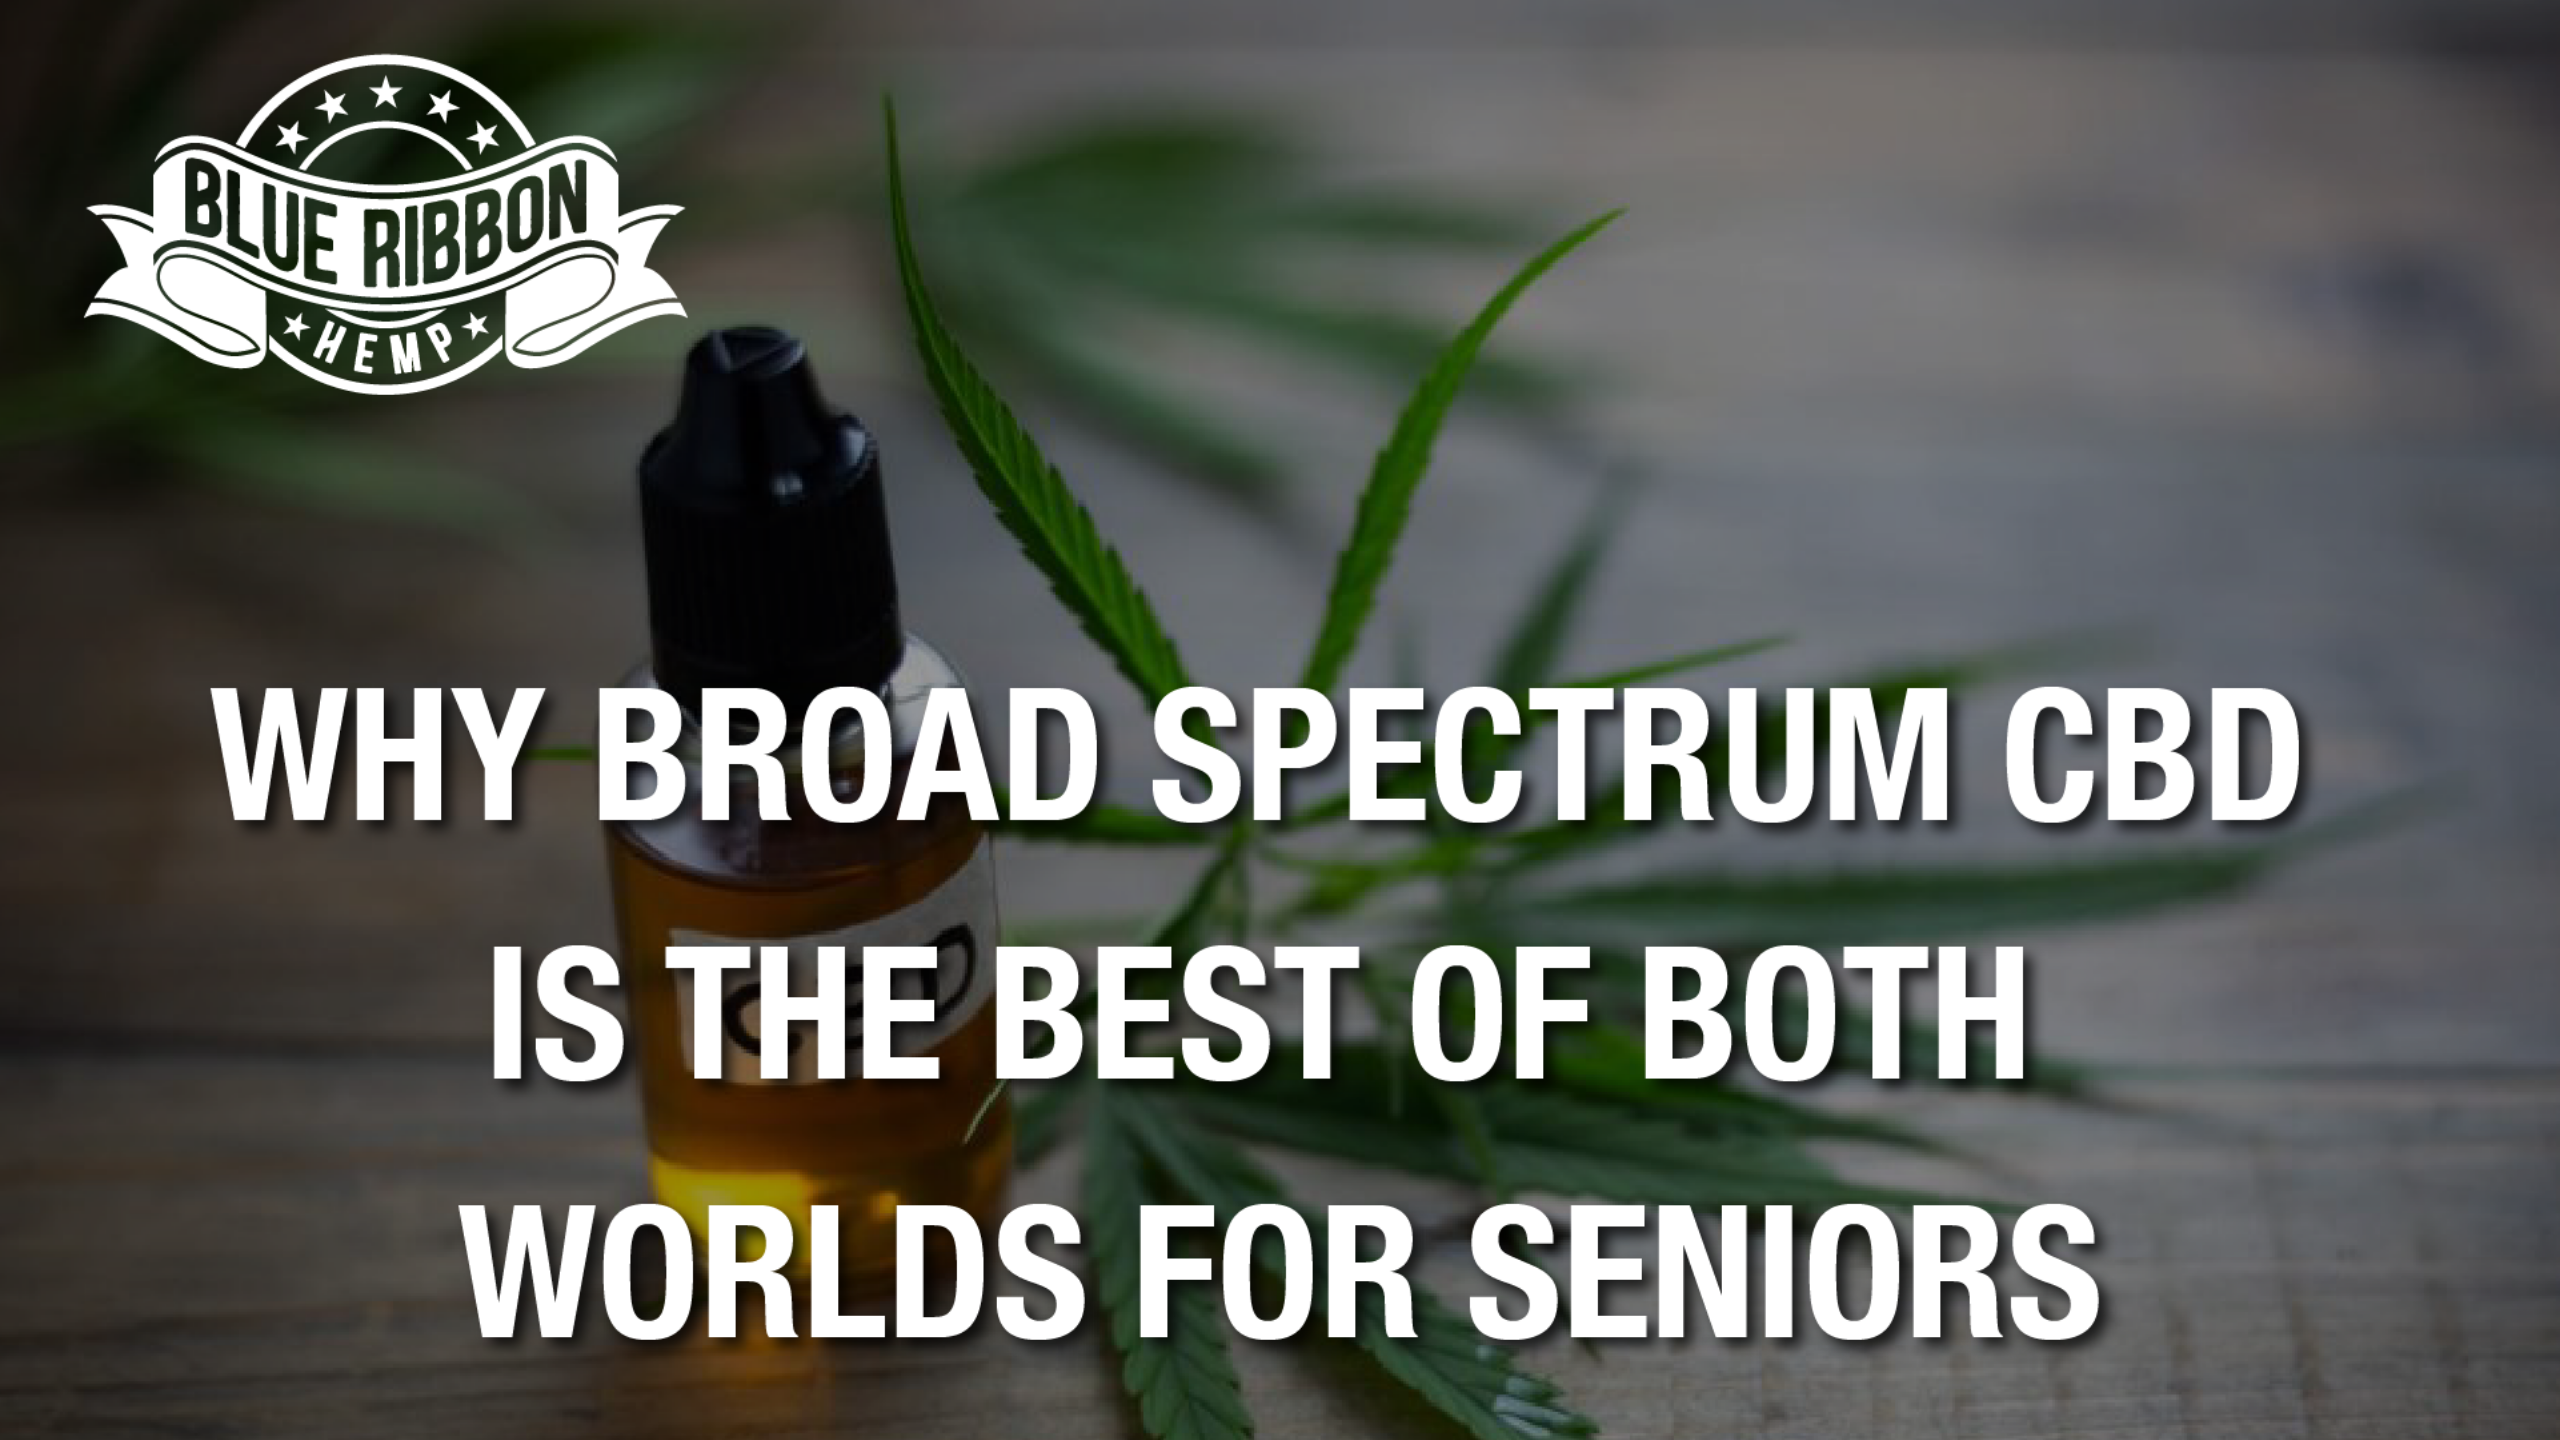 Newsweek AMPLIFY - Broad Spectrum CBD